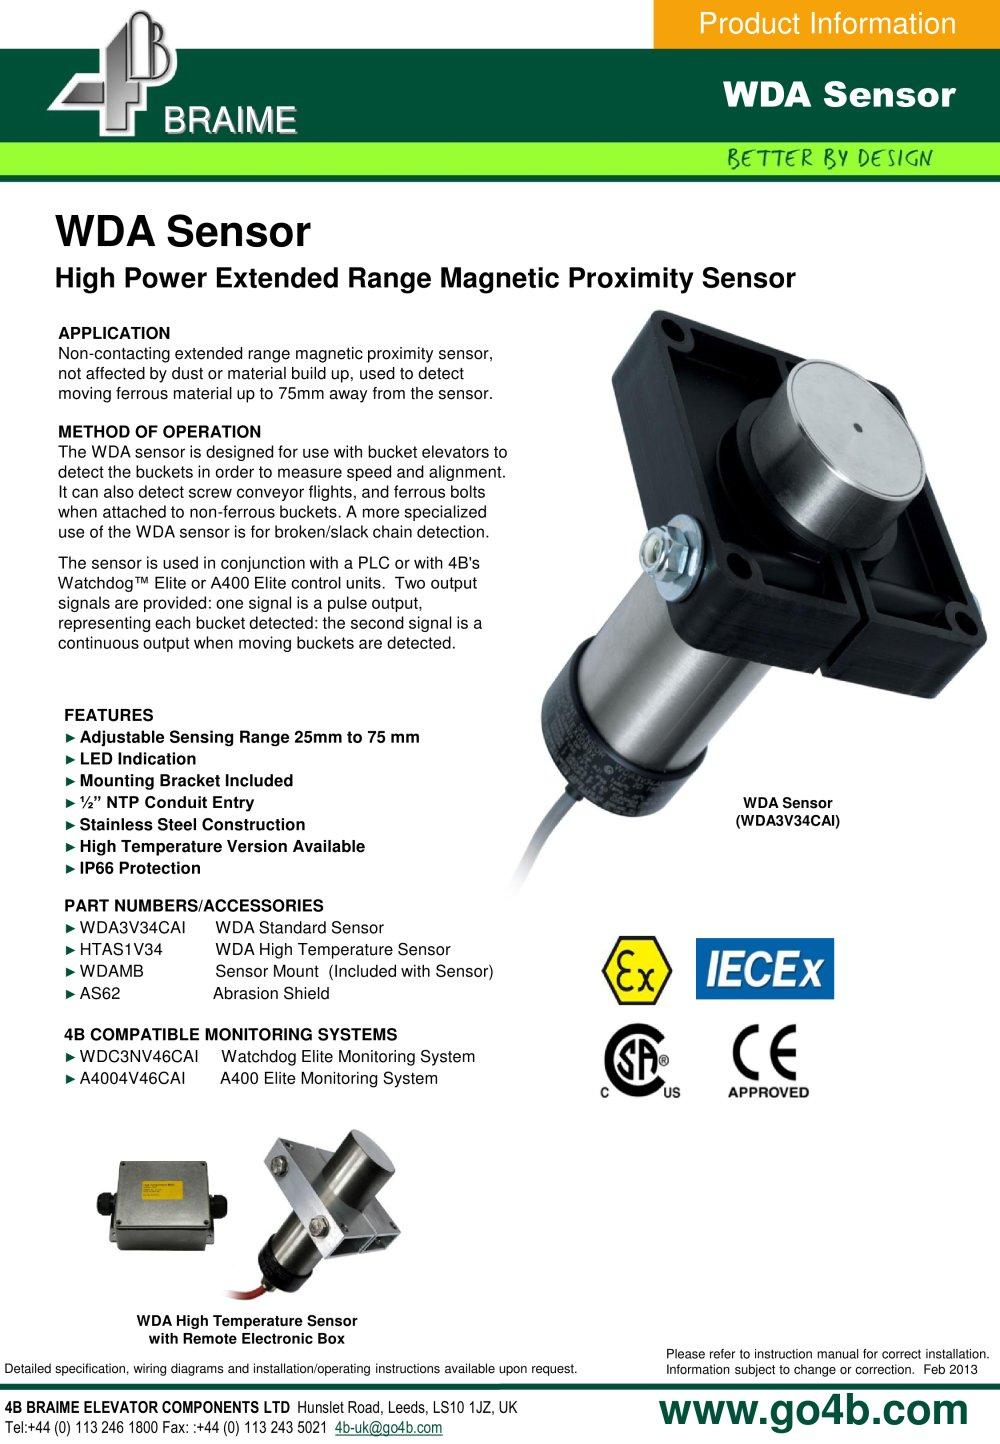 Wda3 New Alignment Sensor For Bucket Elevators 4b Braime Wiring Diagram 1 2 Pages